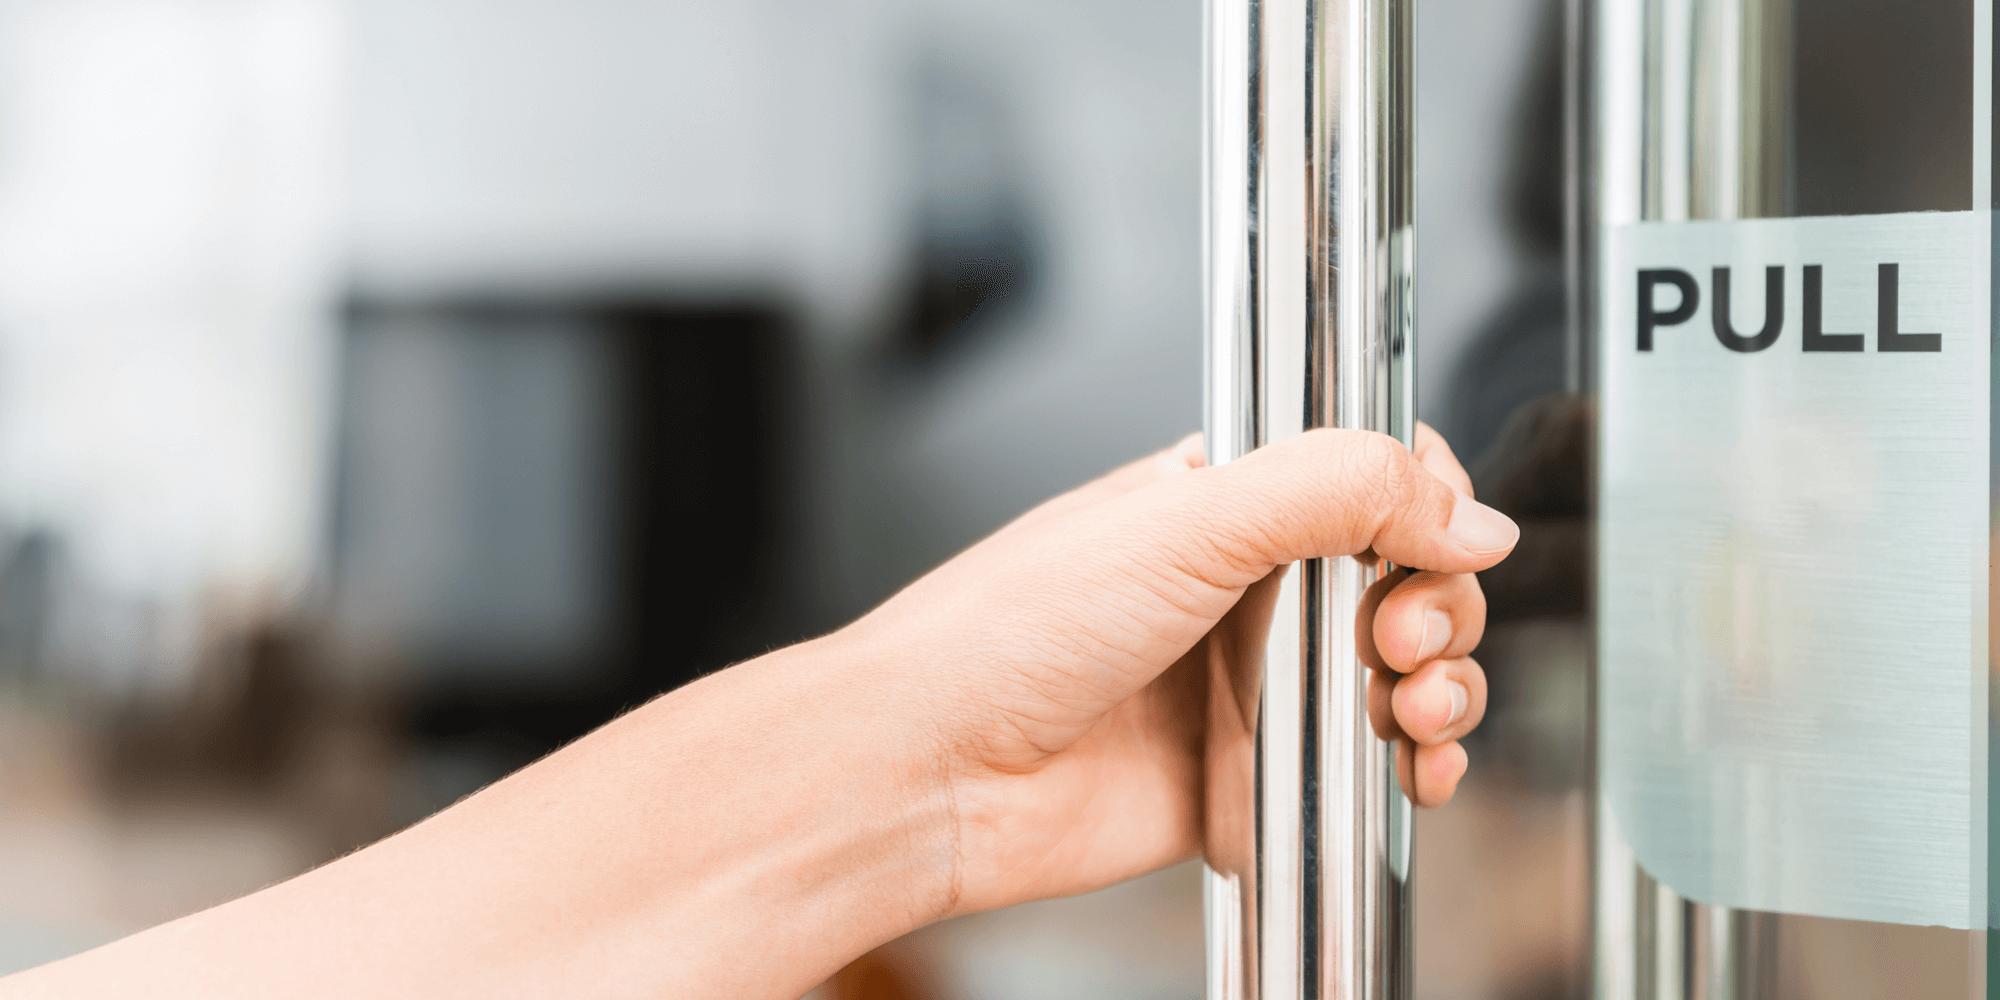 Banner image - hand pulling open a glass door.